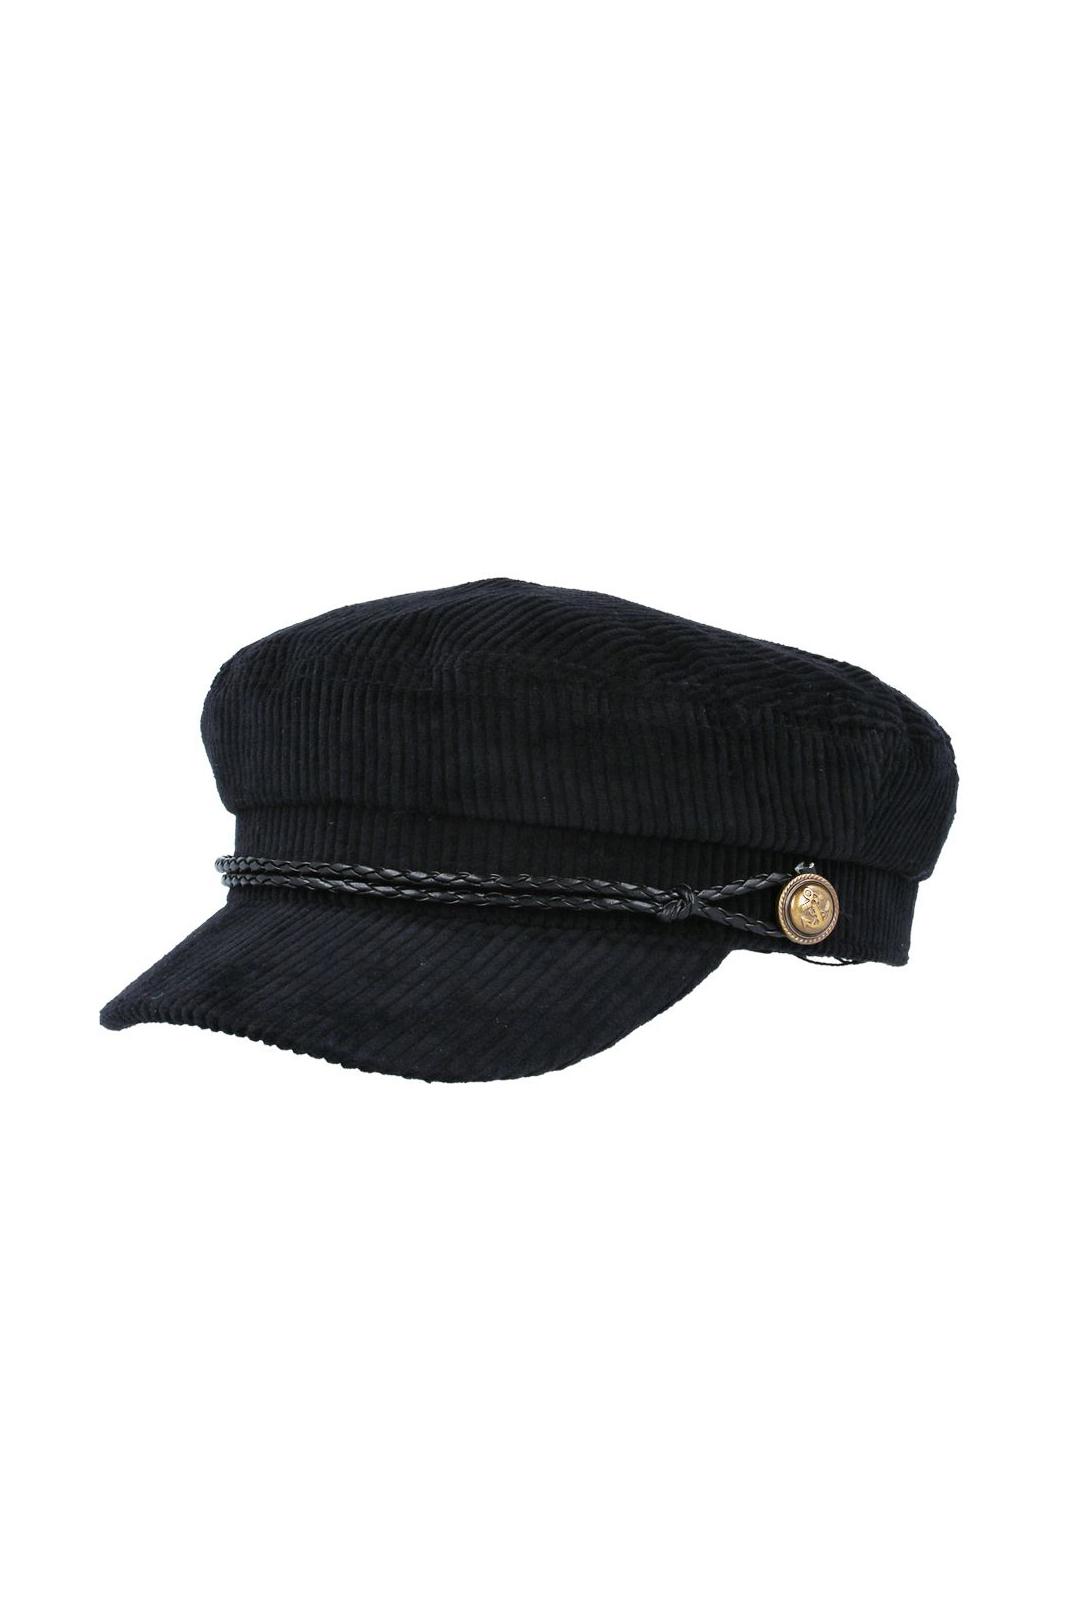 Maz Corduroy Breton Hat Black